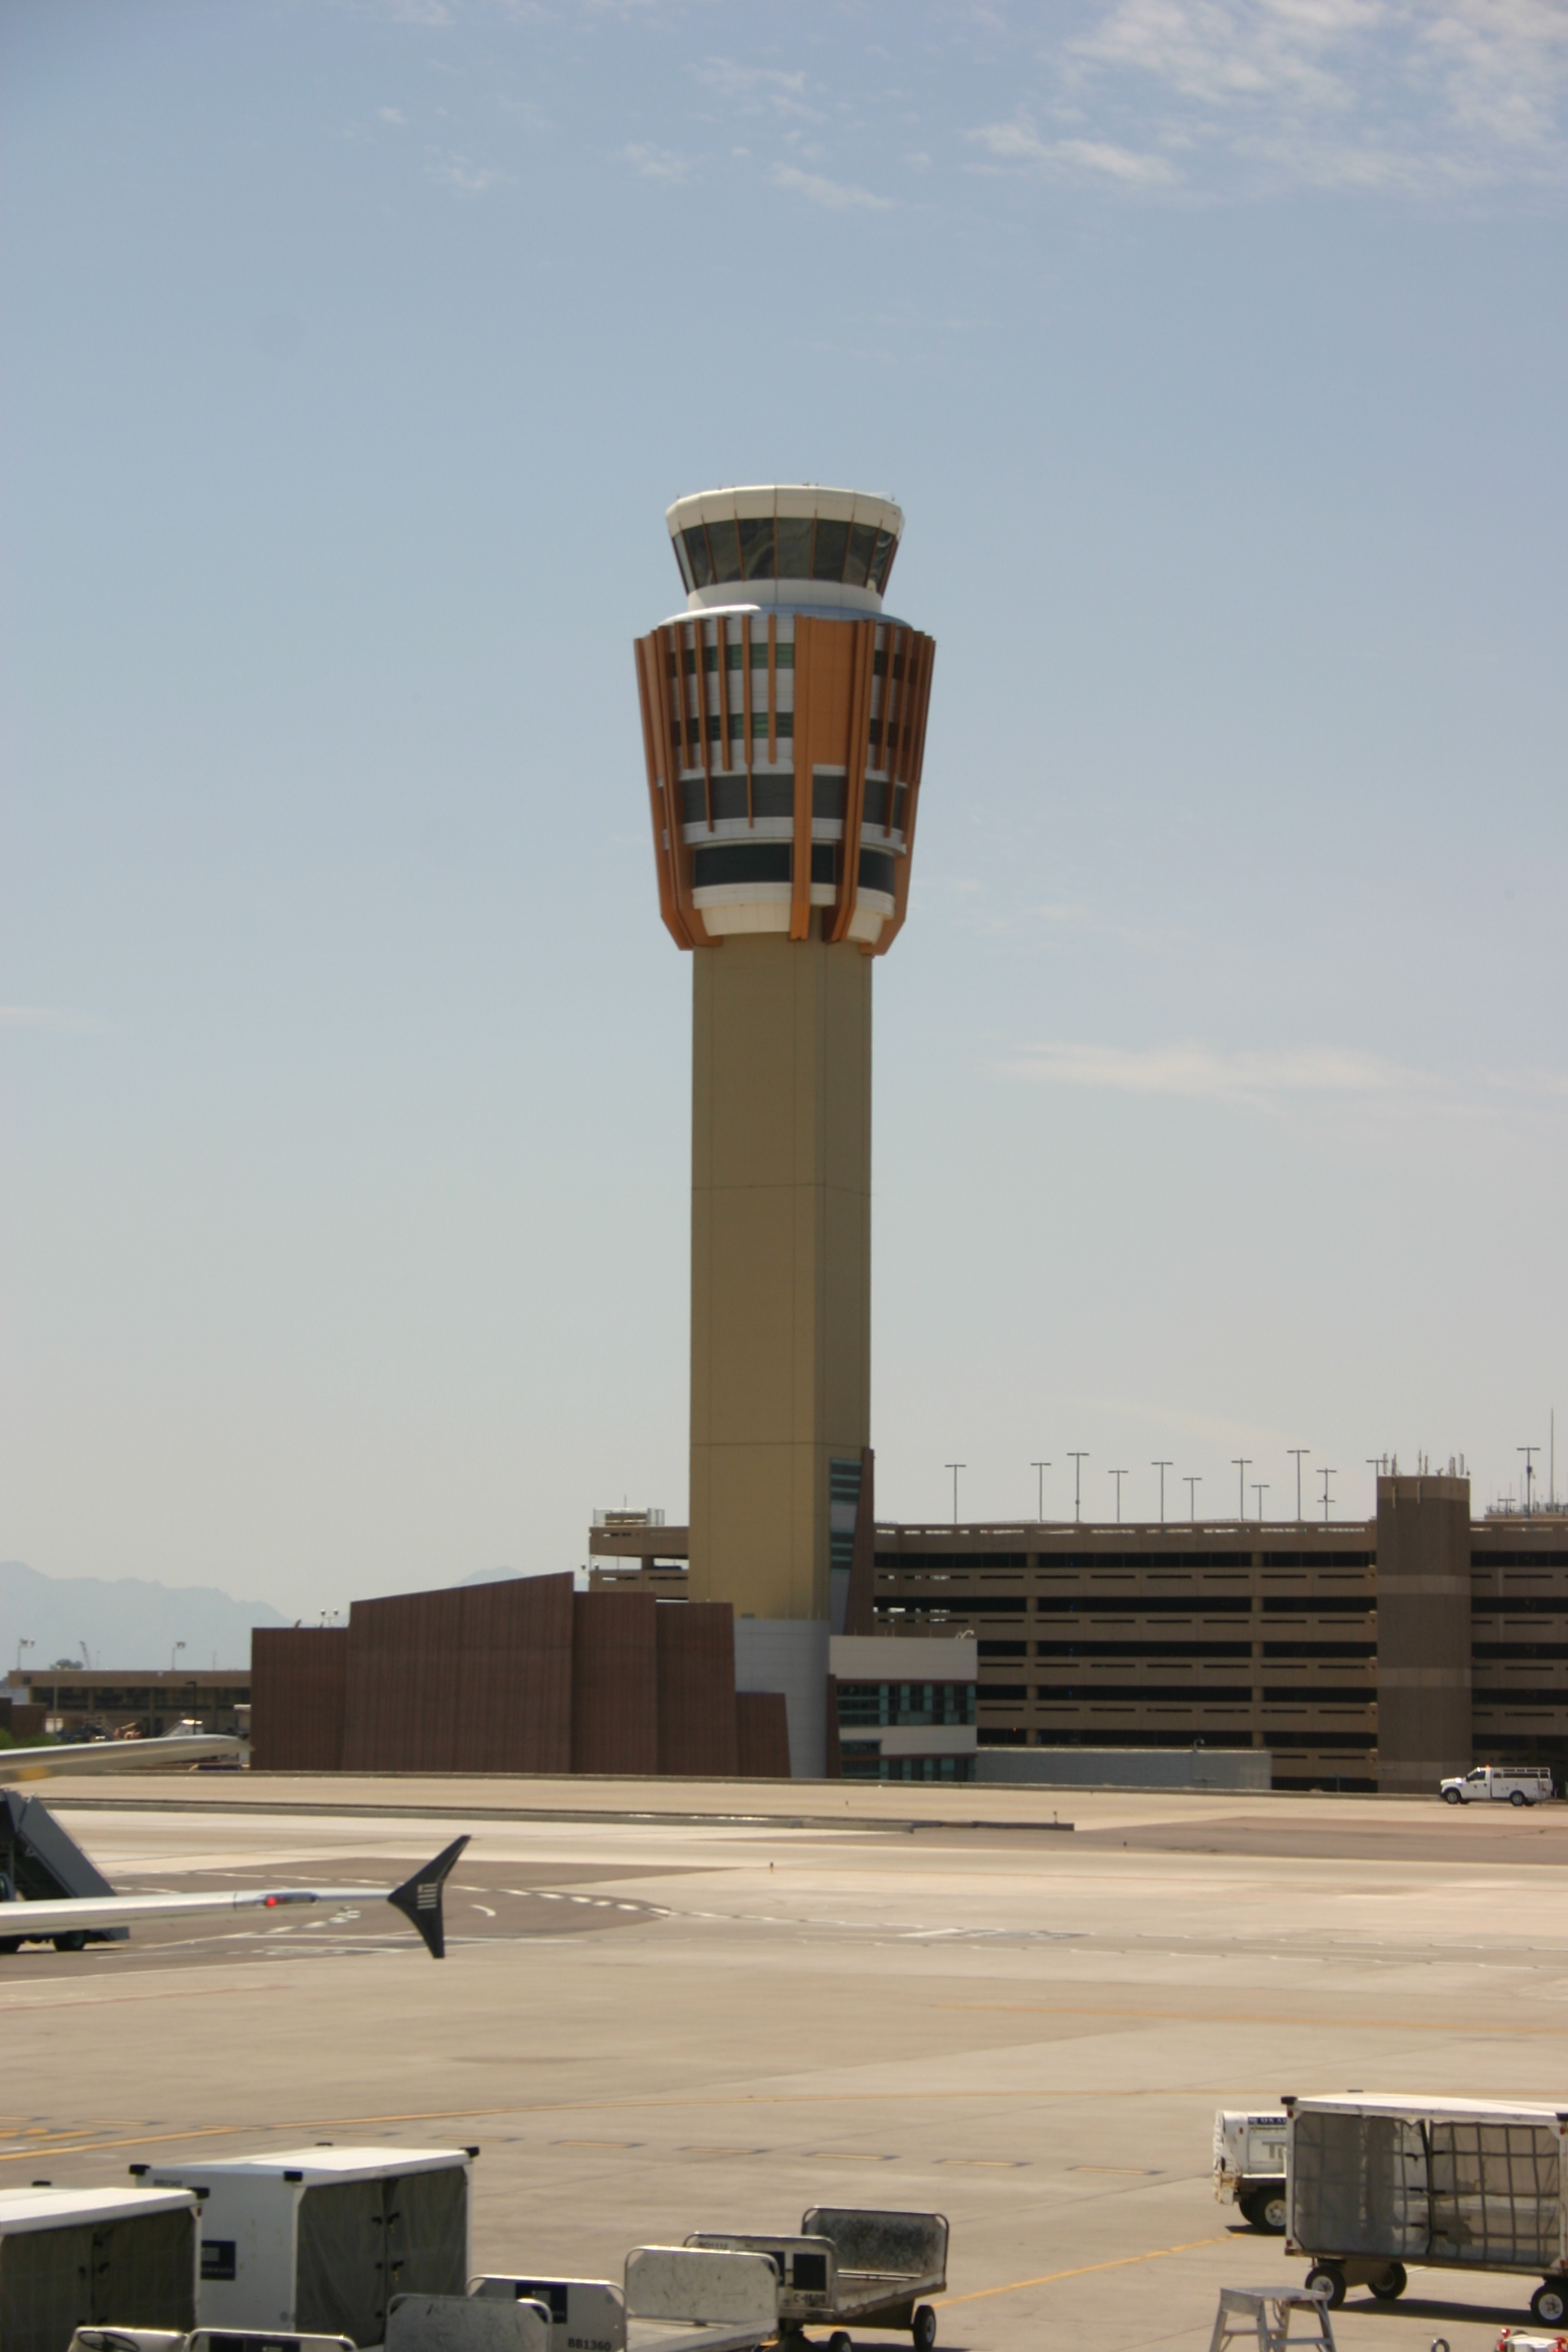 phoenix sky harbor international airport wikipedia phoenix sky harbor international